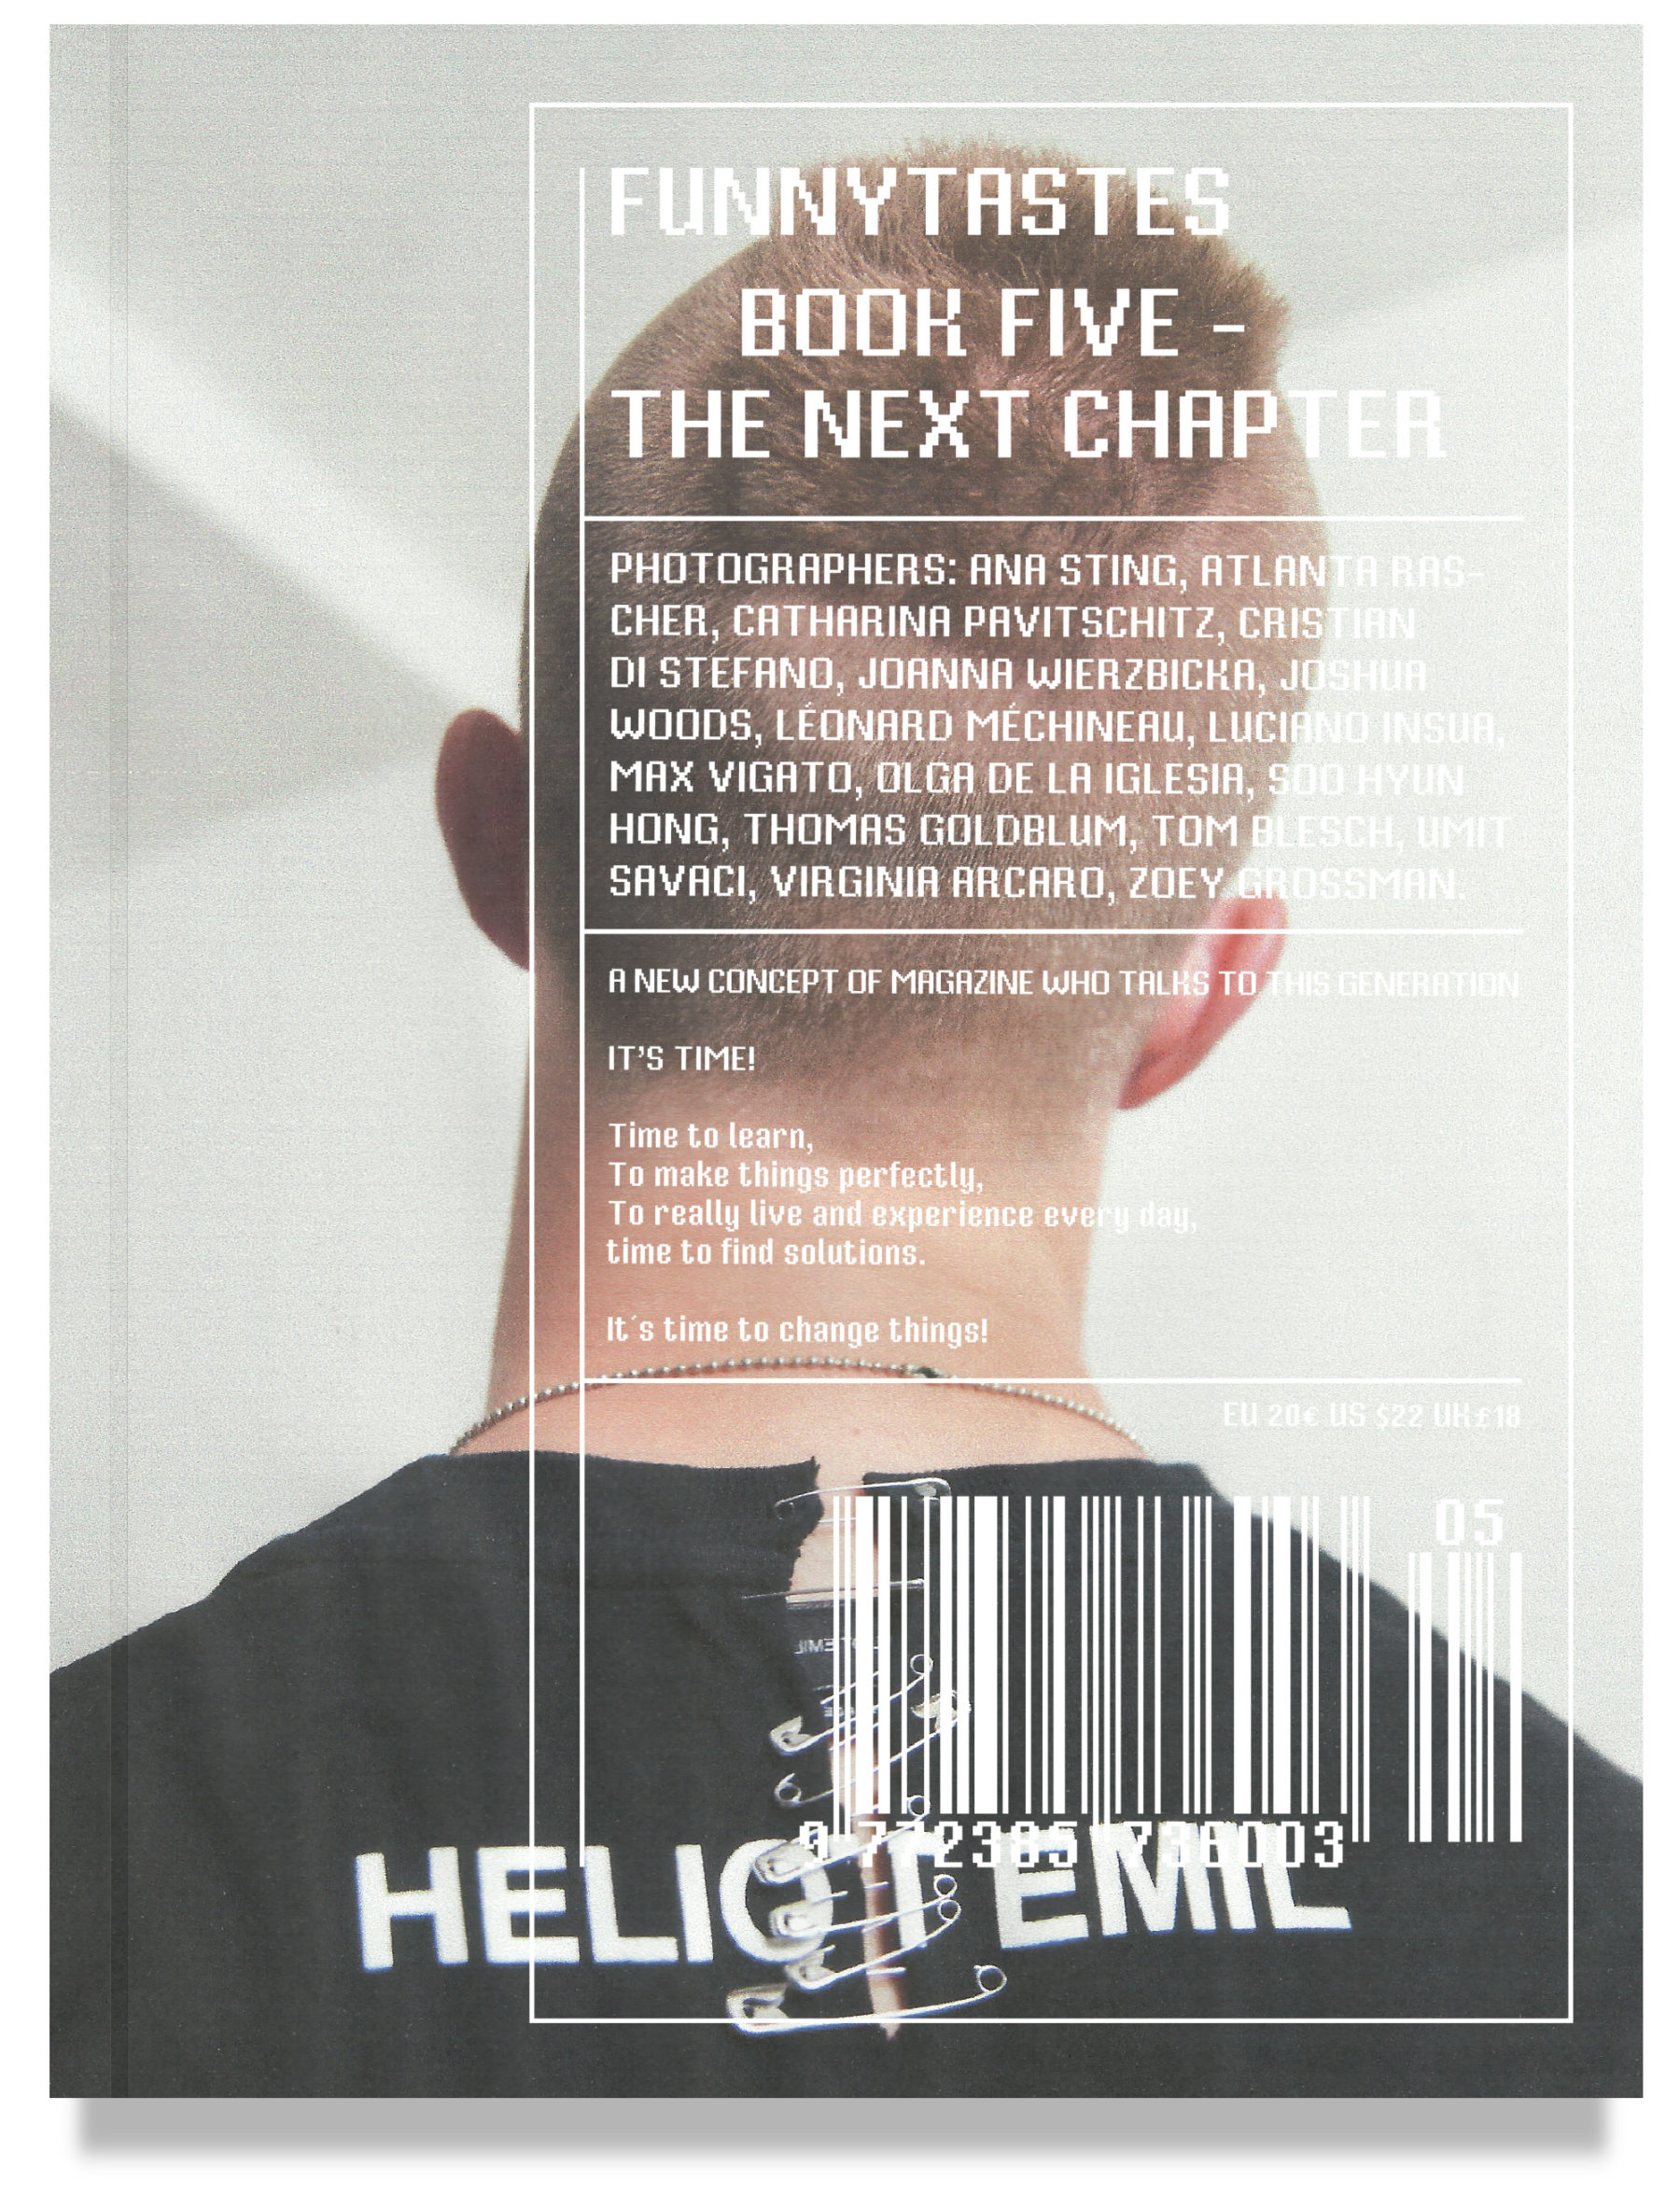 Funnytastes Magazine Book Five